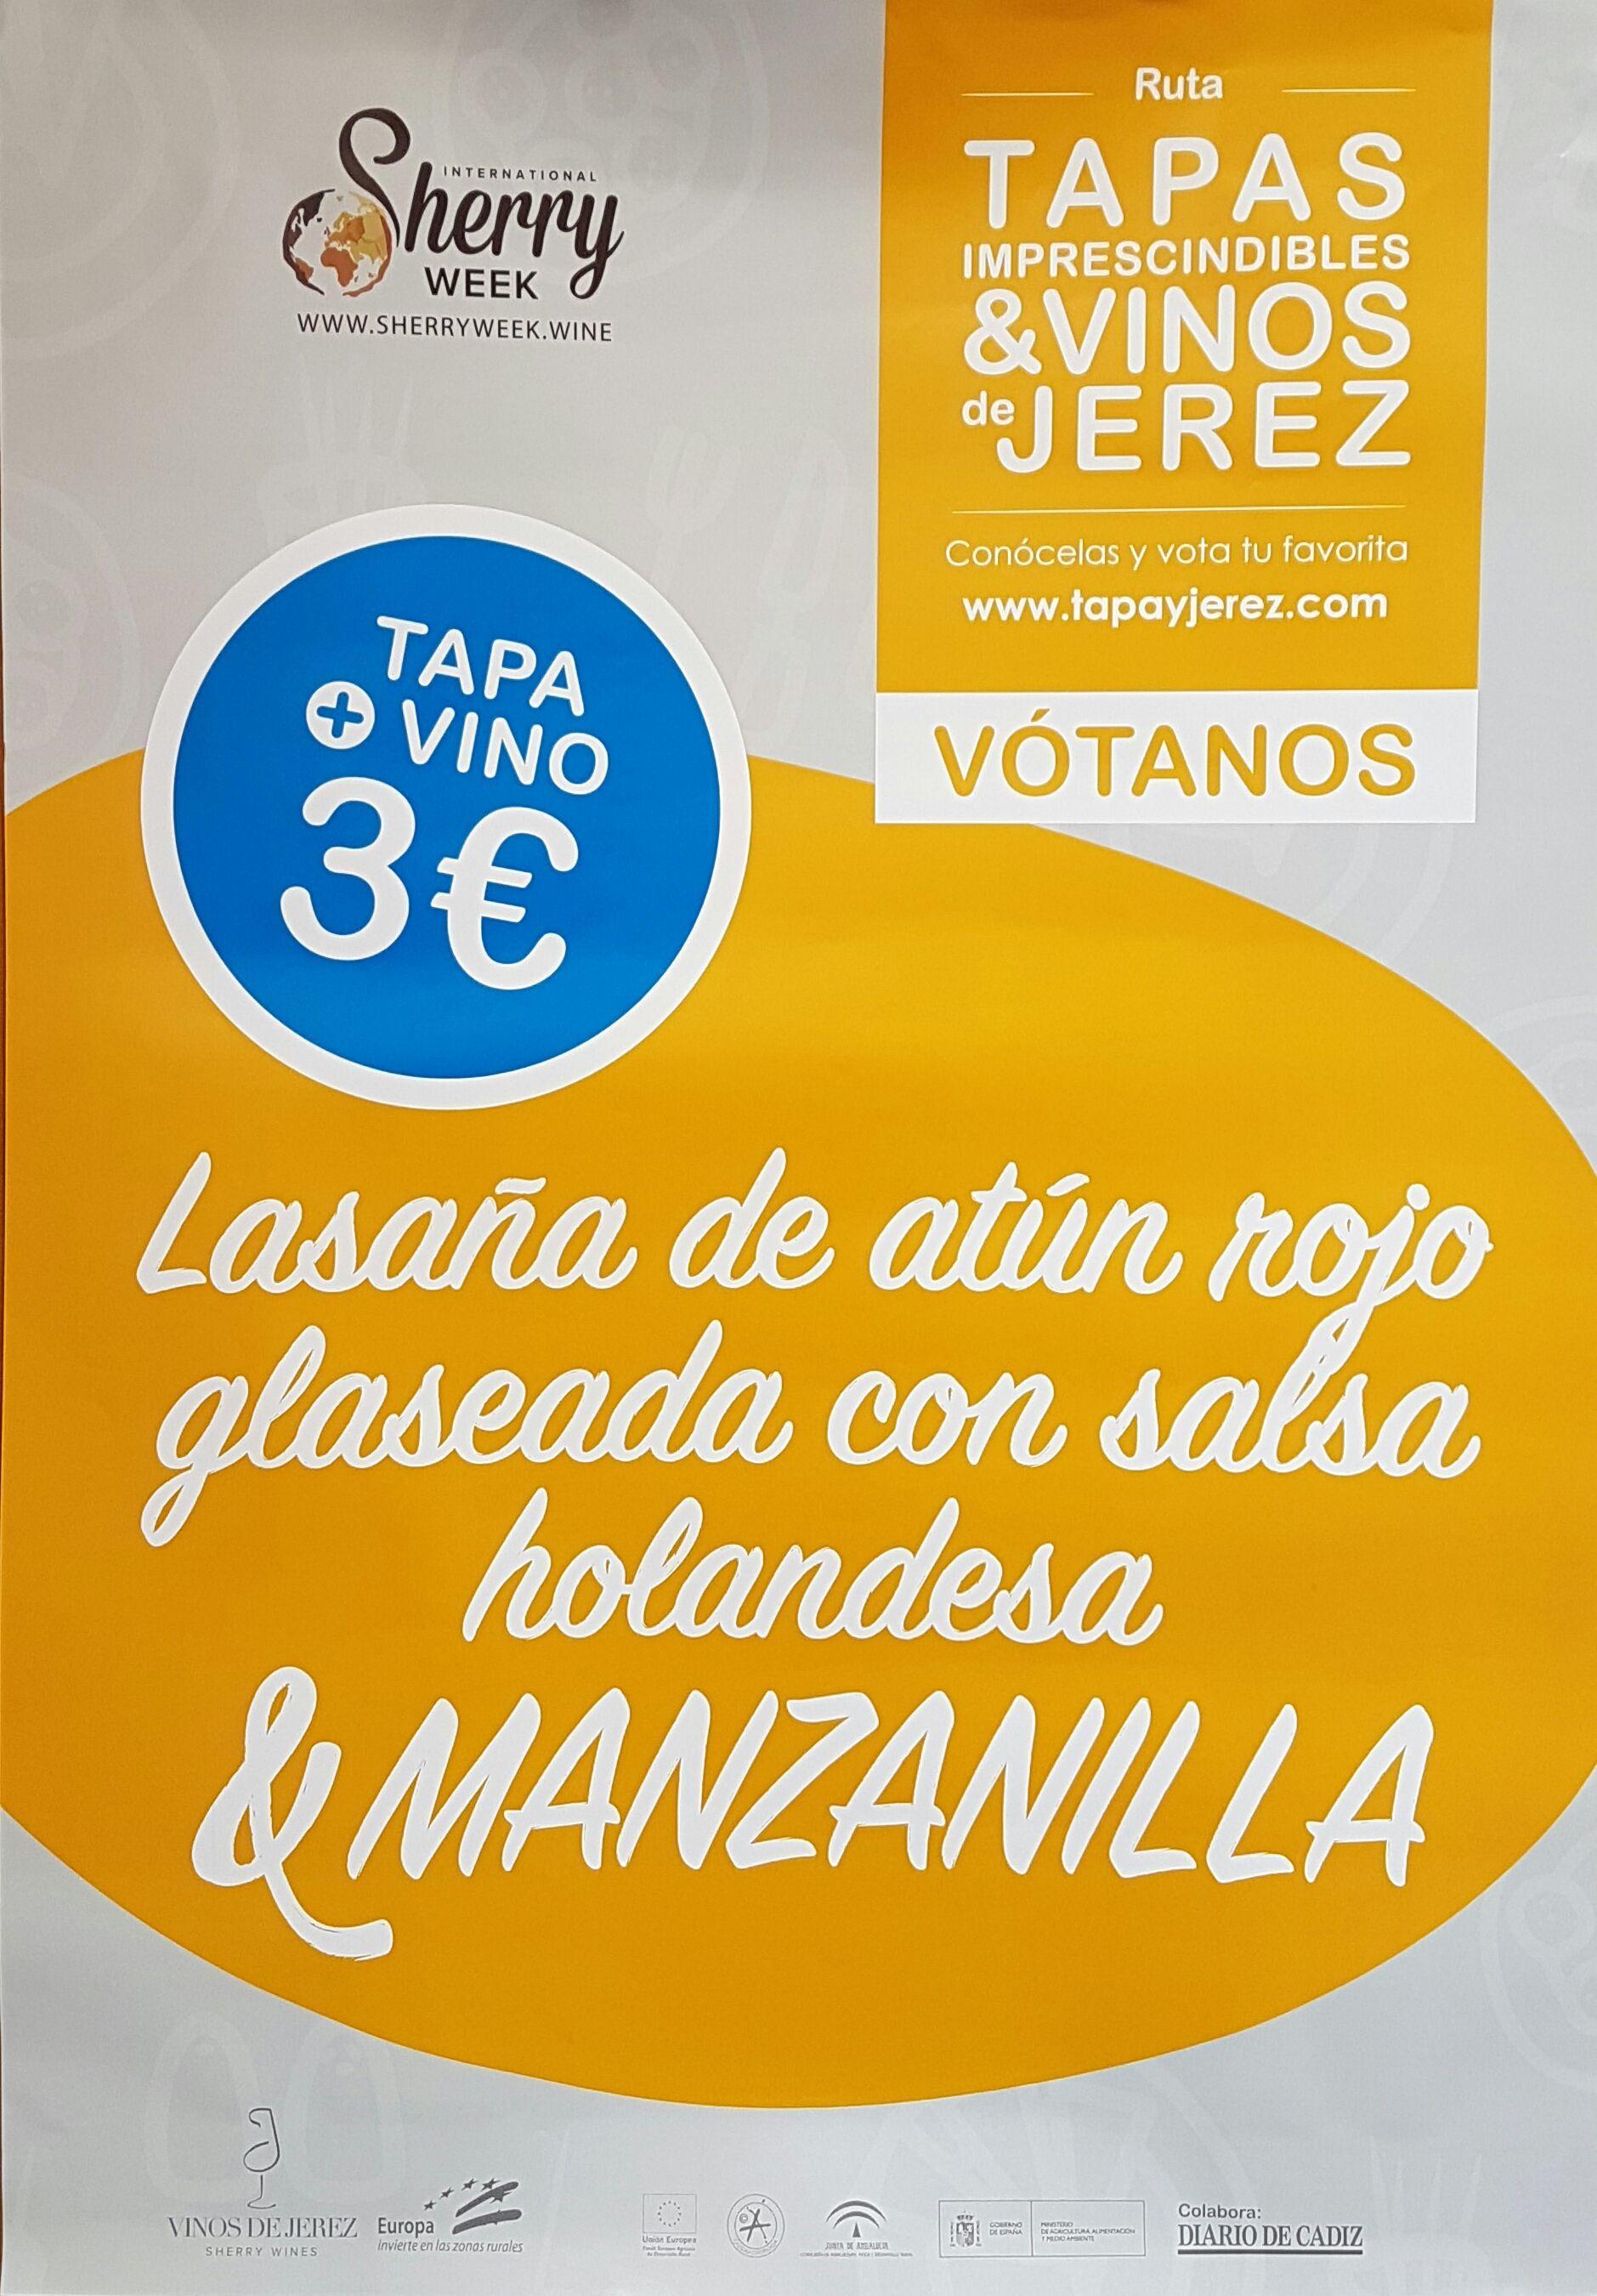 Ruta de las Tapas Imprescindibles & Jerez